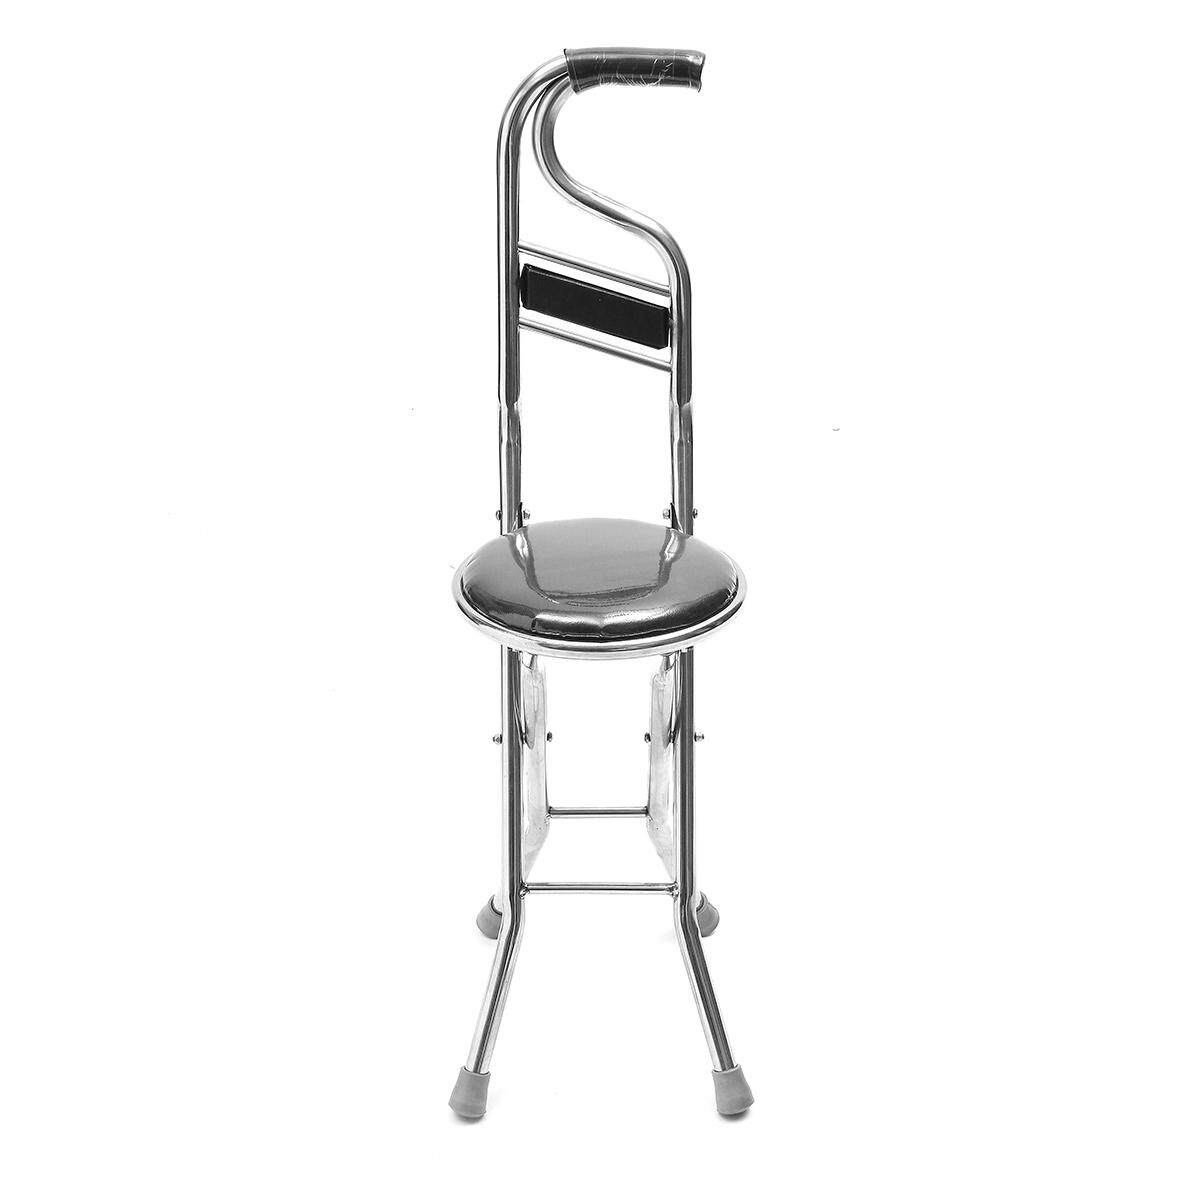 Stainless Steel Portable Folding Walking Stick Chair Seat Stool Travel Cane # Black